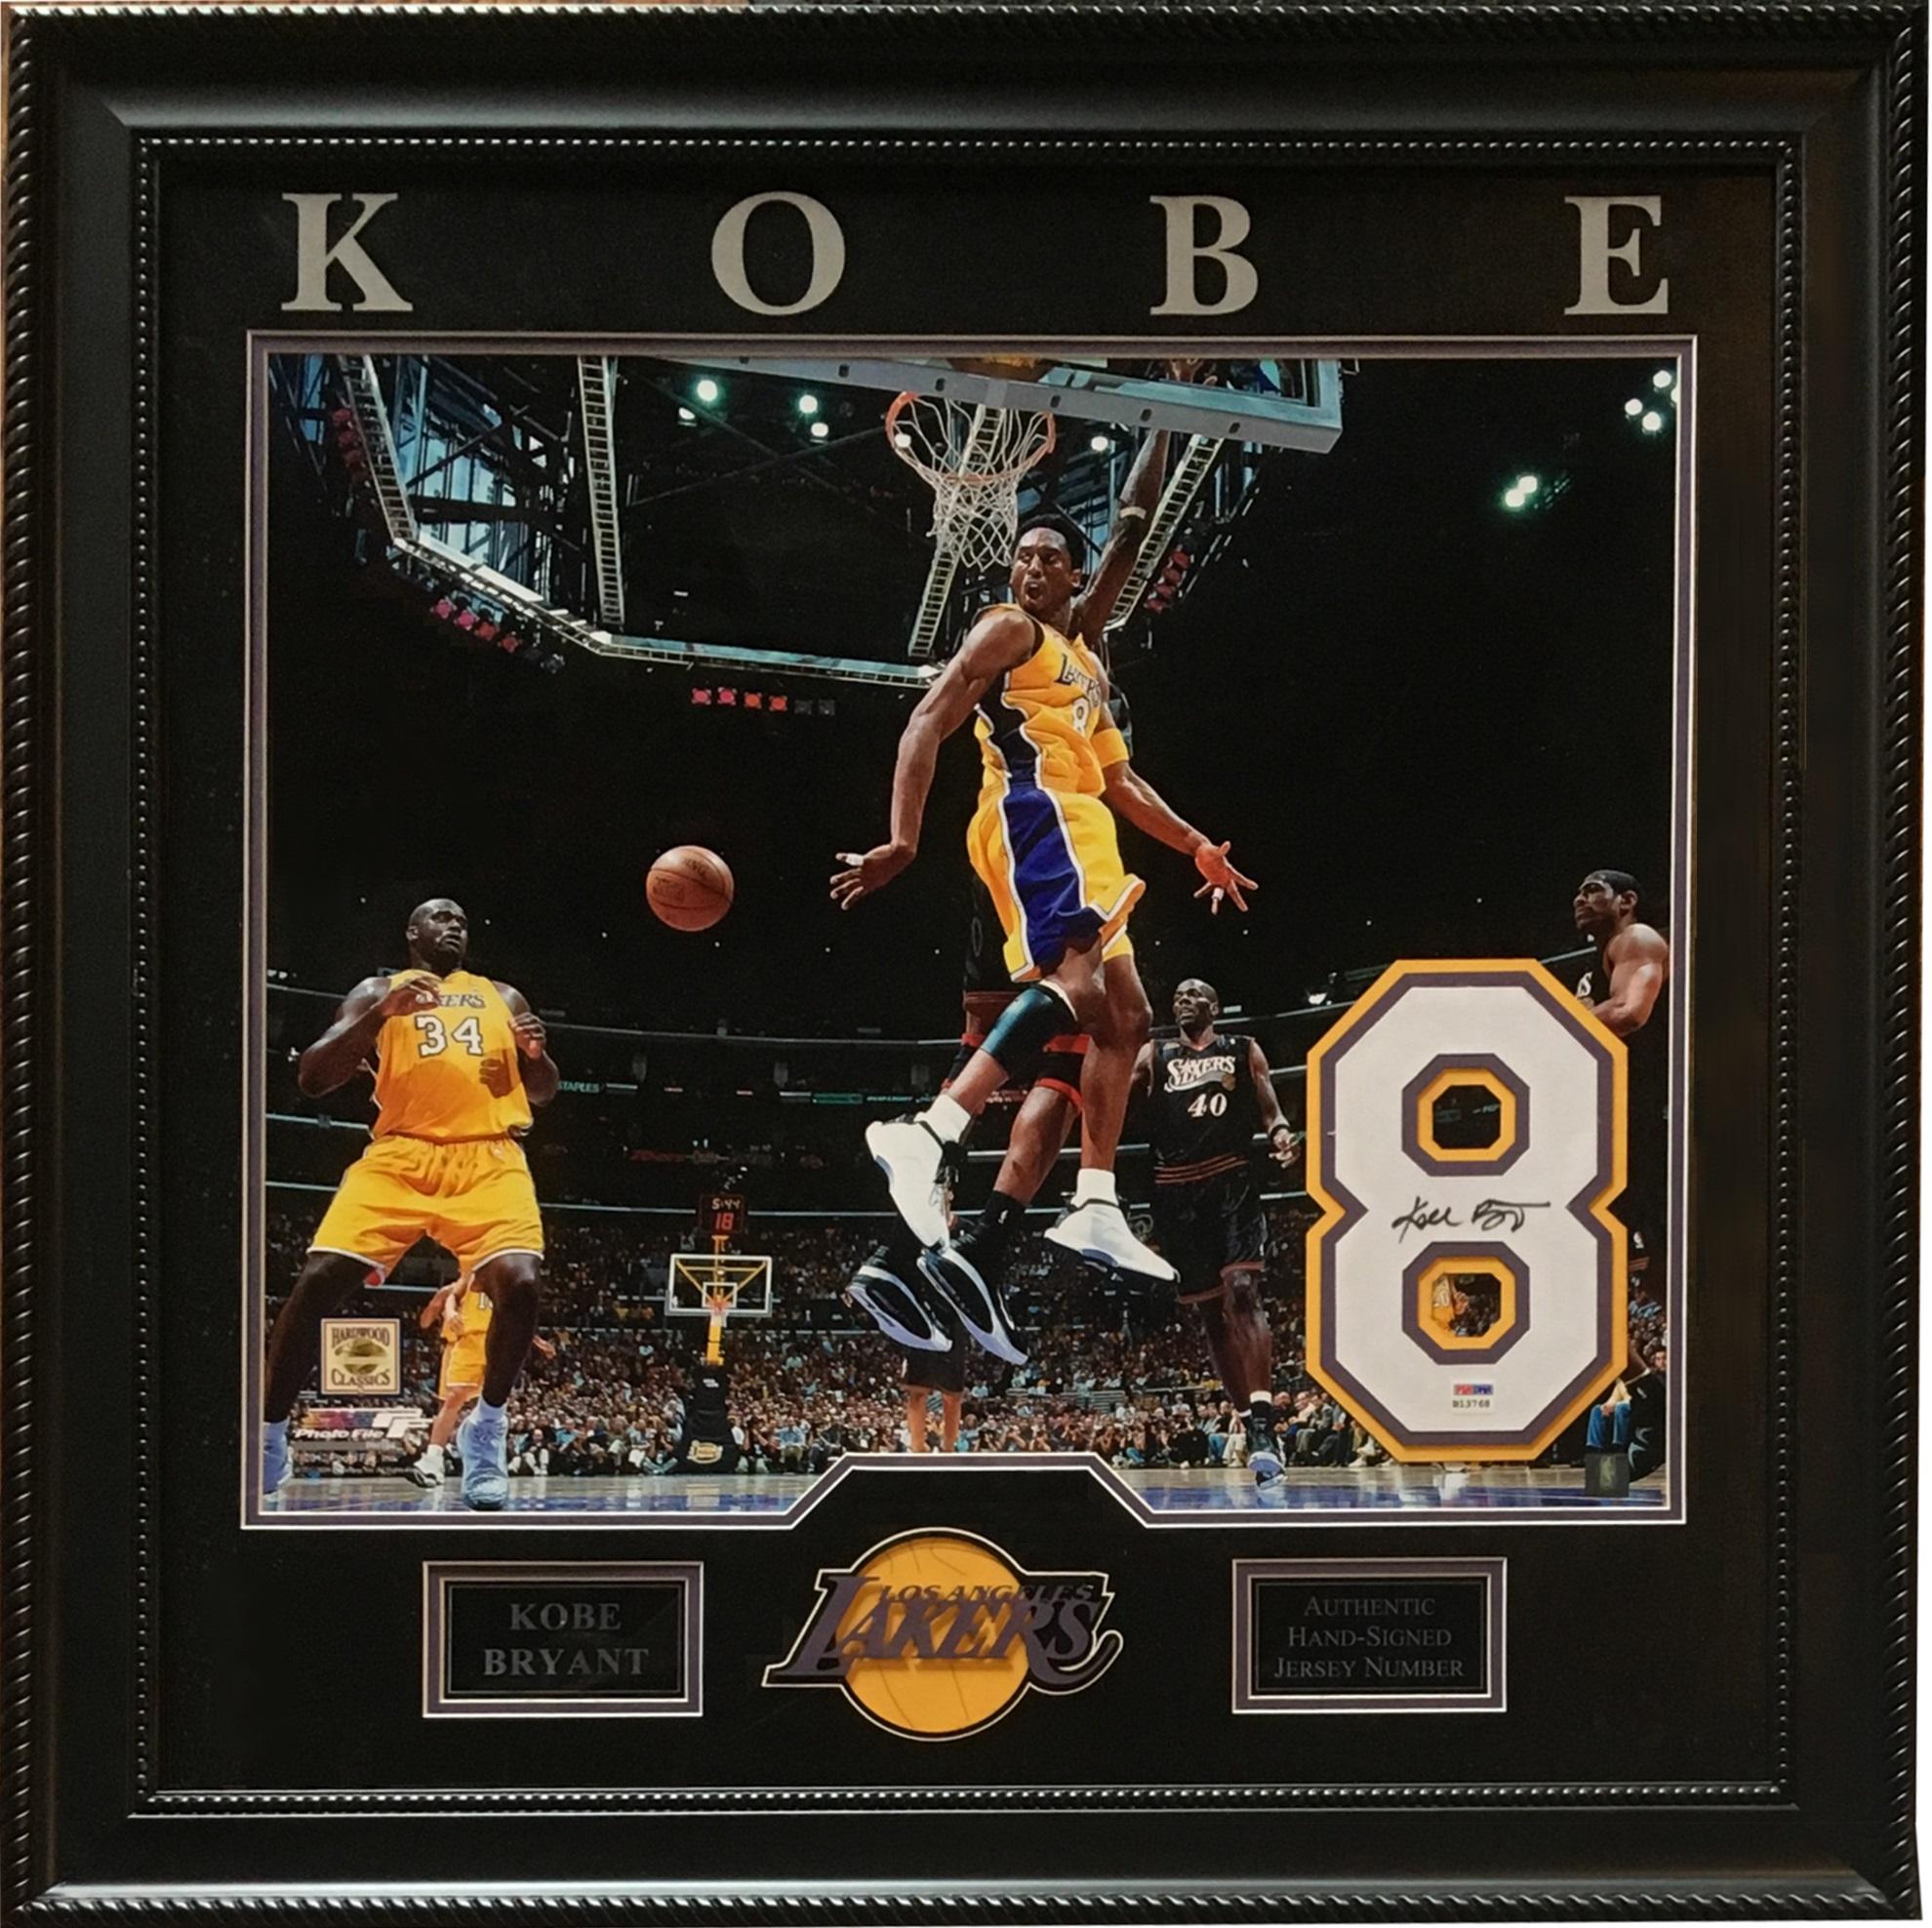 Kobe Bryant Signed Lakers #8 Jersey # 2001 finals 20×24 PHOTO framed PSA coa